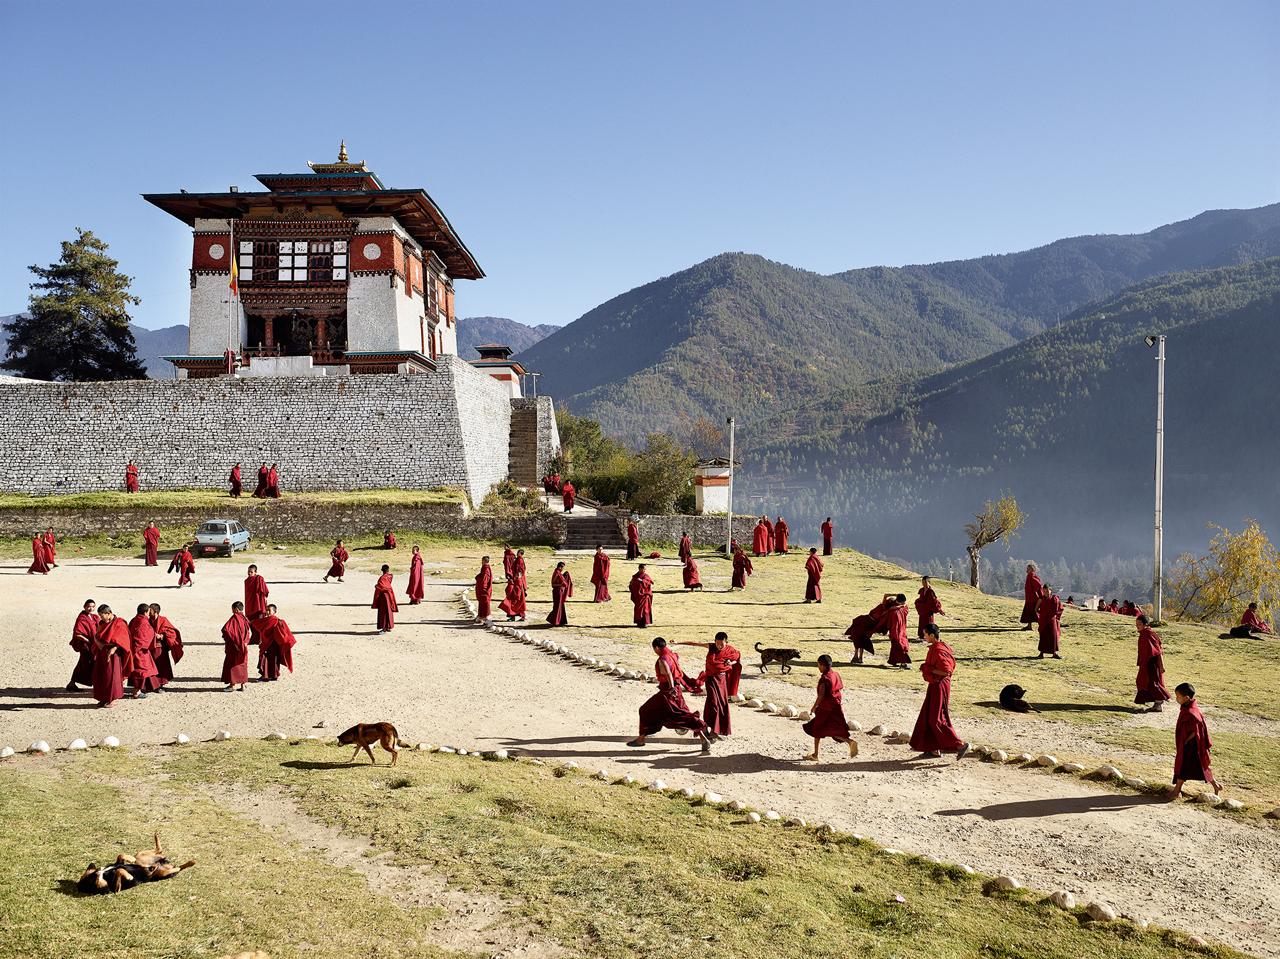 JAMES MOLLISON,  Dechen Phodrang, Thimphu, Bhutan,  November 24, 2011